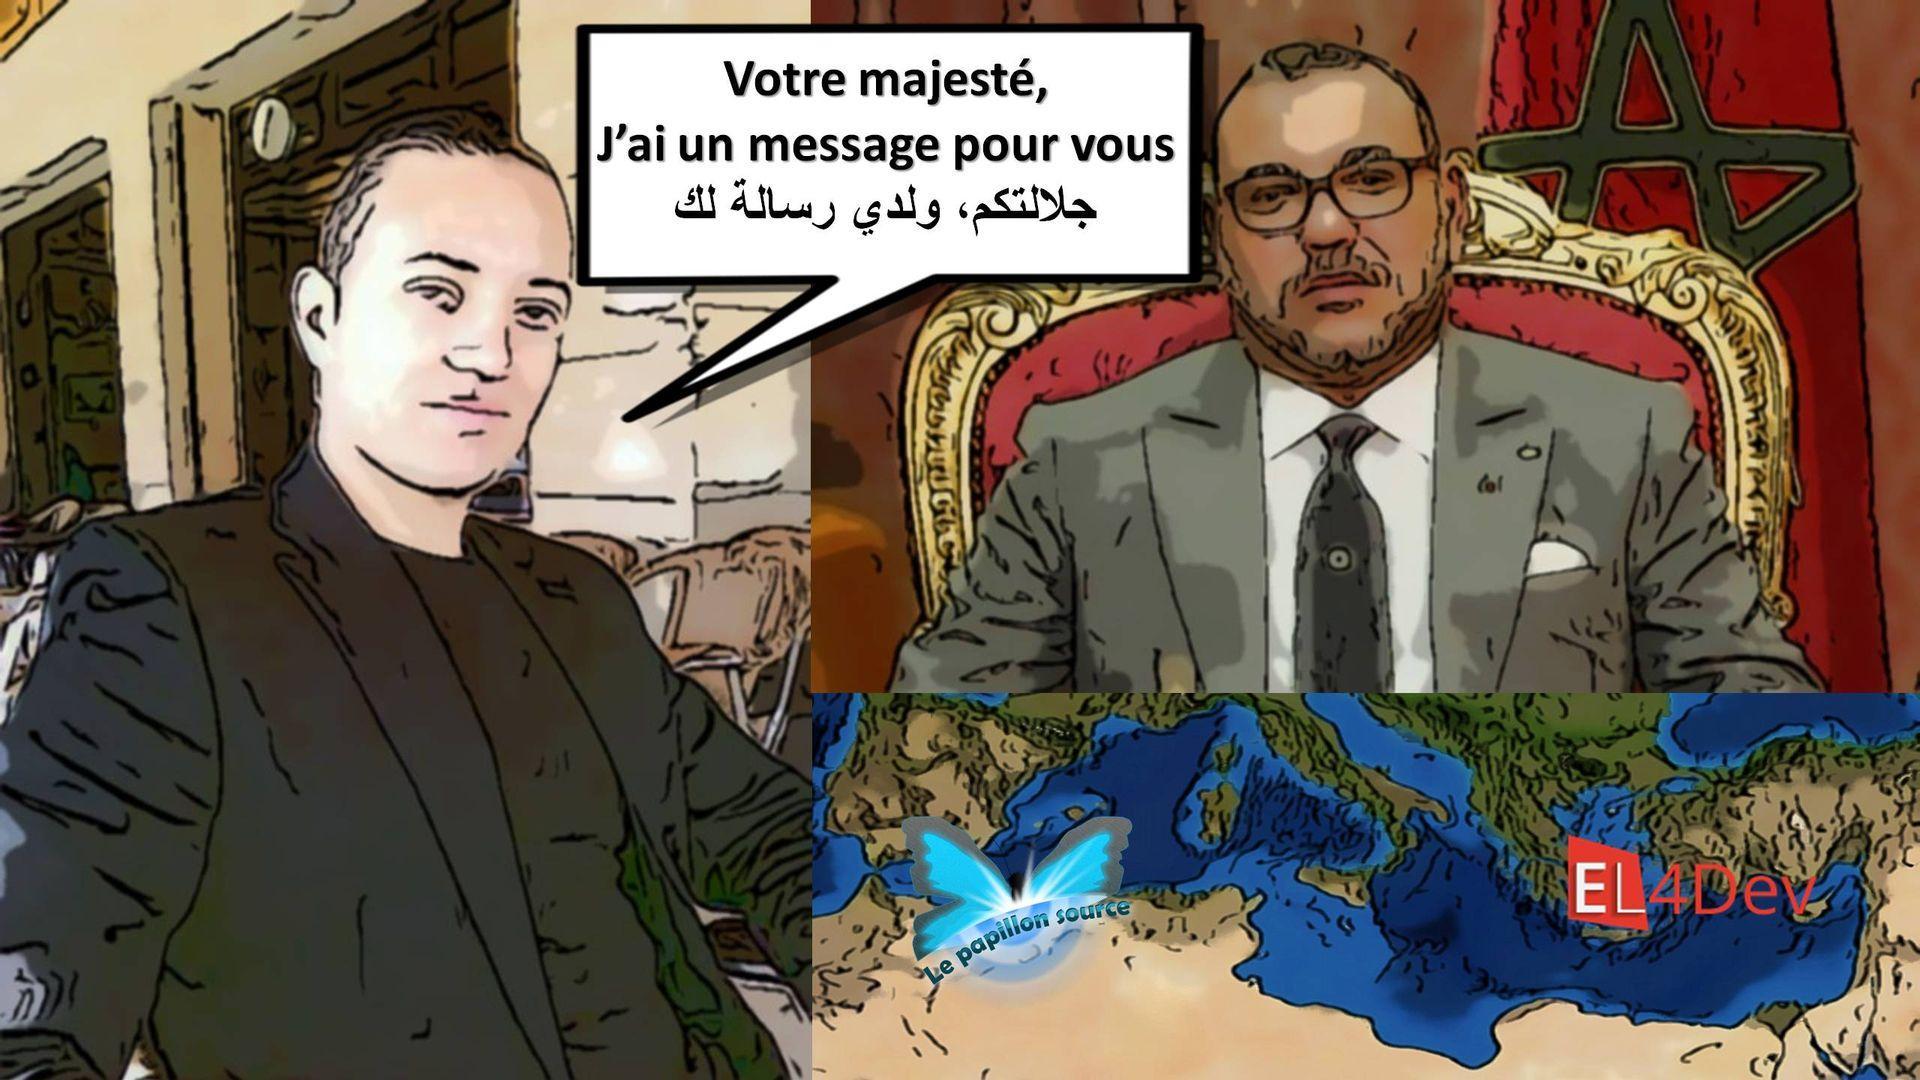 1 paul elvere valerien delsart le papillon source mediterranee el4dev message pour mohammed vi maroc resultat